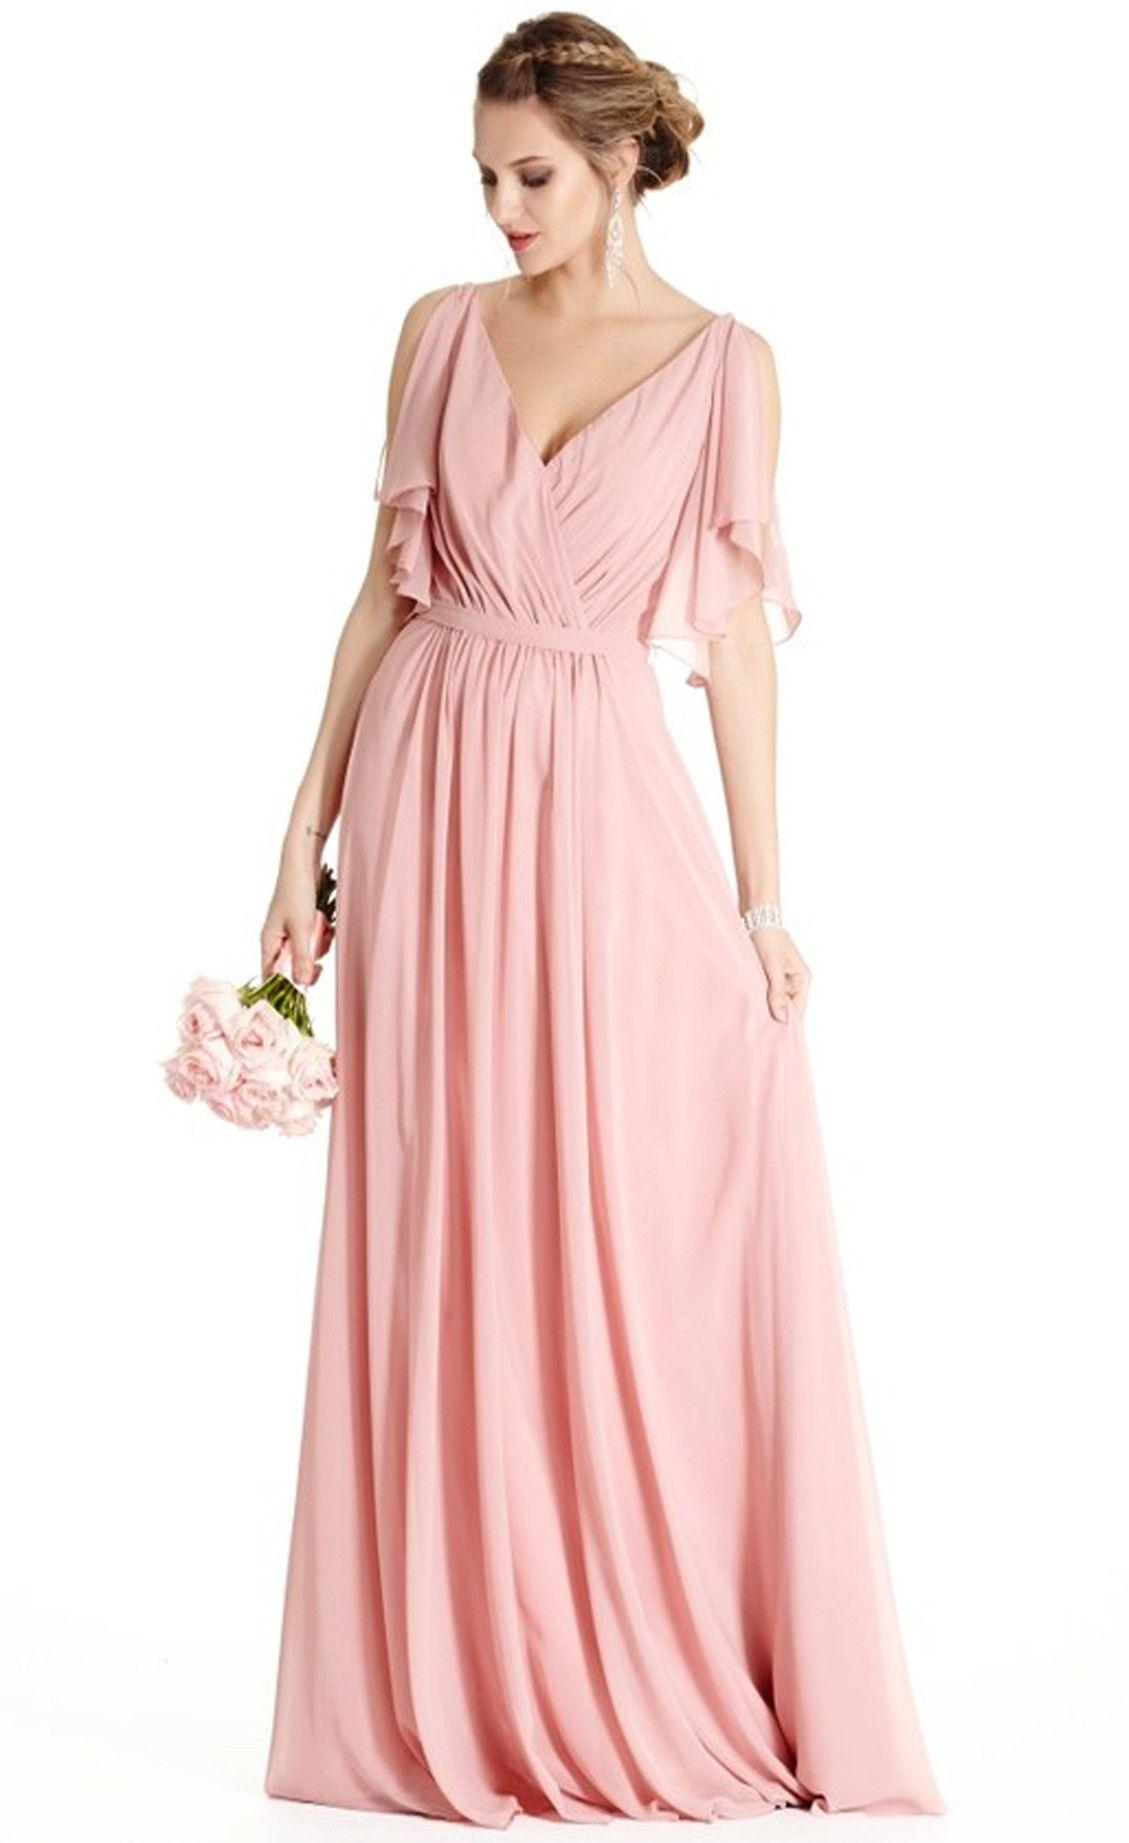 Serendipity Blush Flutter Sleeve Bridesmaids Dress | Vestiditos y Boda